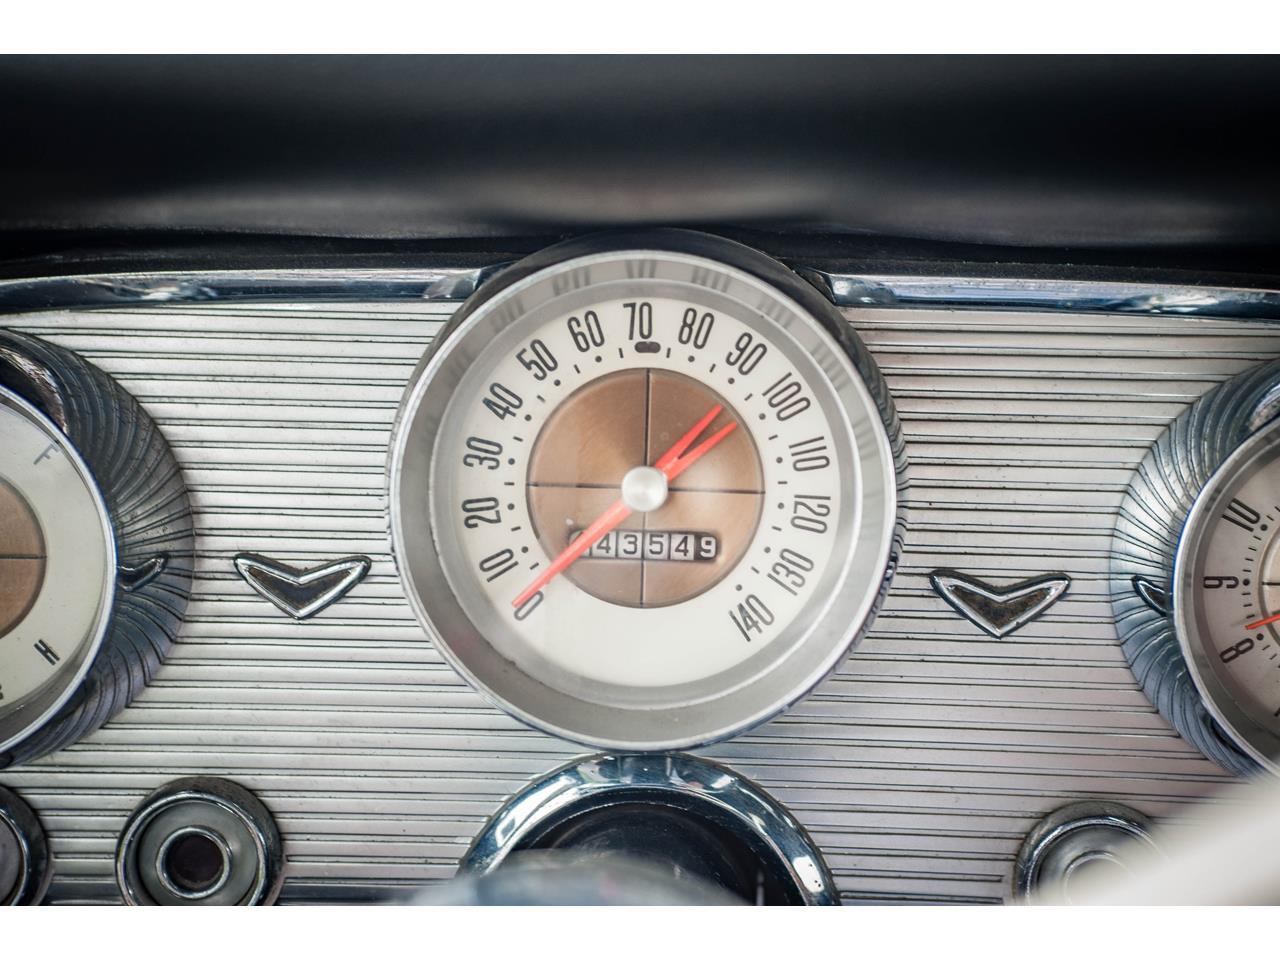 Large Picture of '60 Thunderbird located in O'Fallon Illinois - $40,500.00 - QB9W